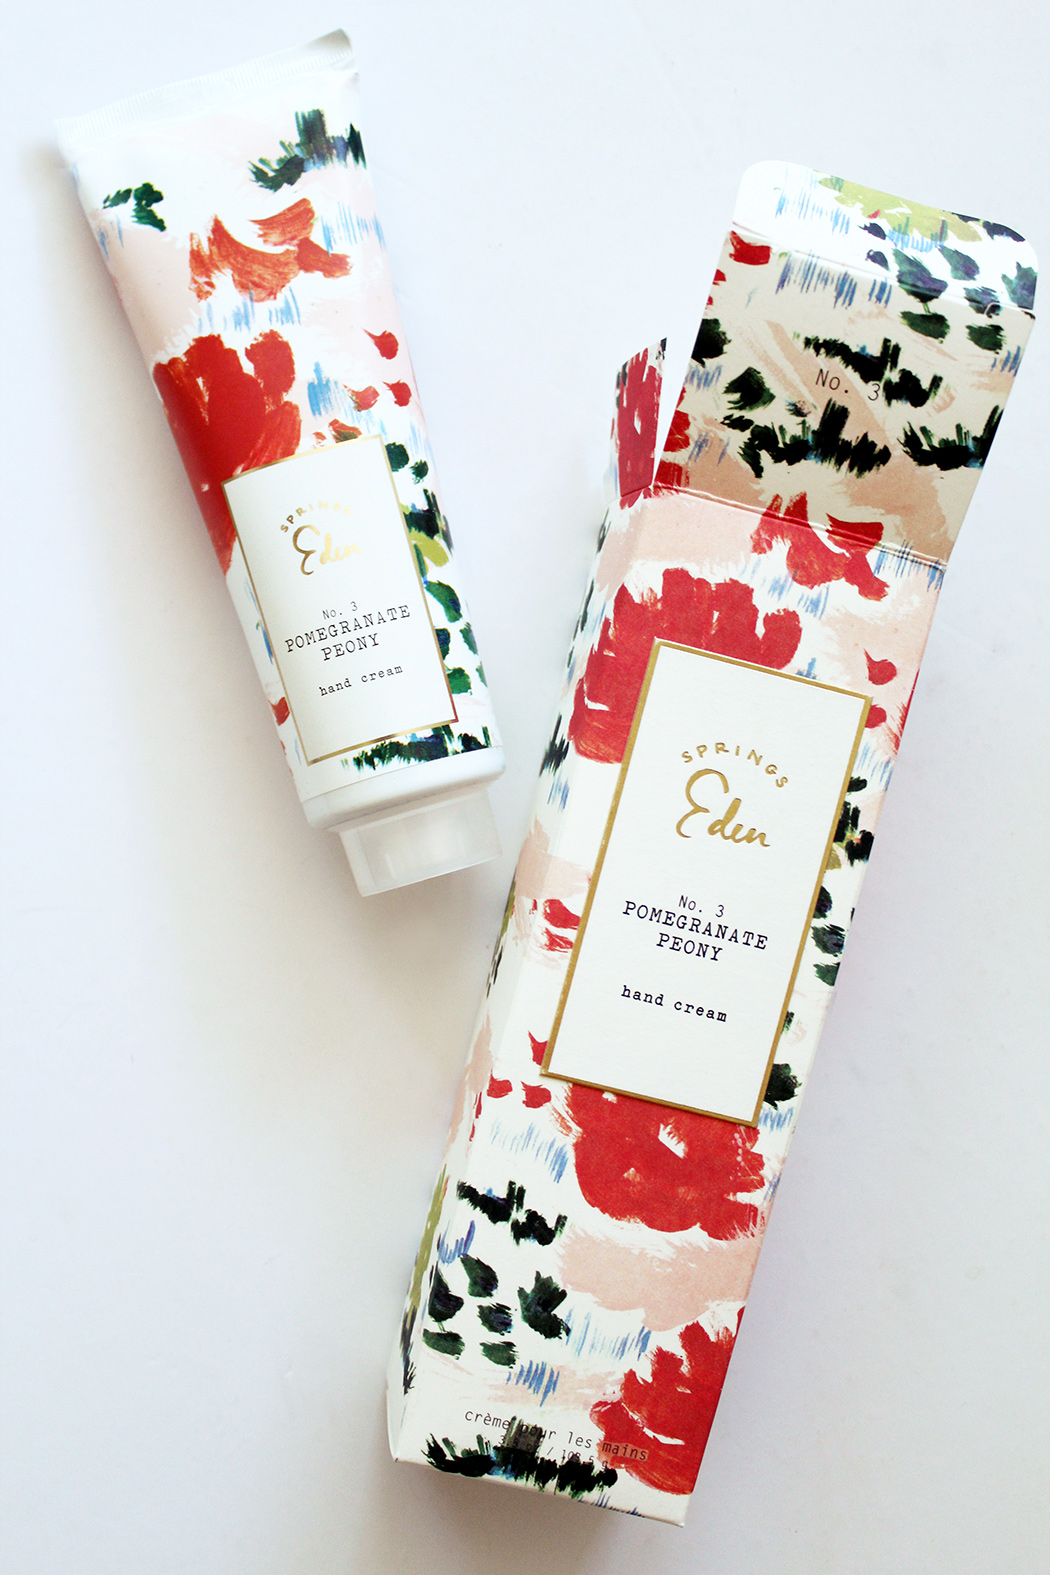 Eden-Springs-hand-cream